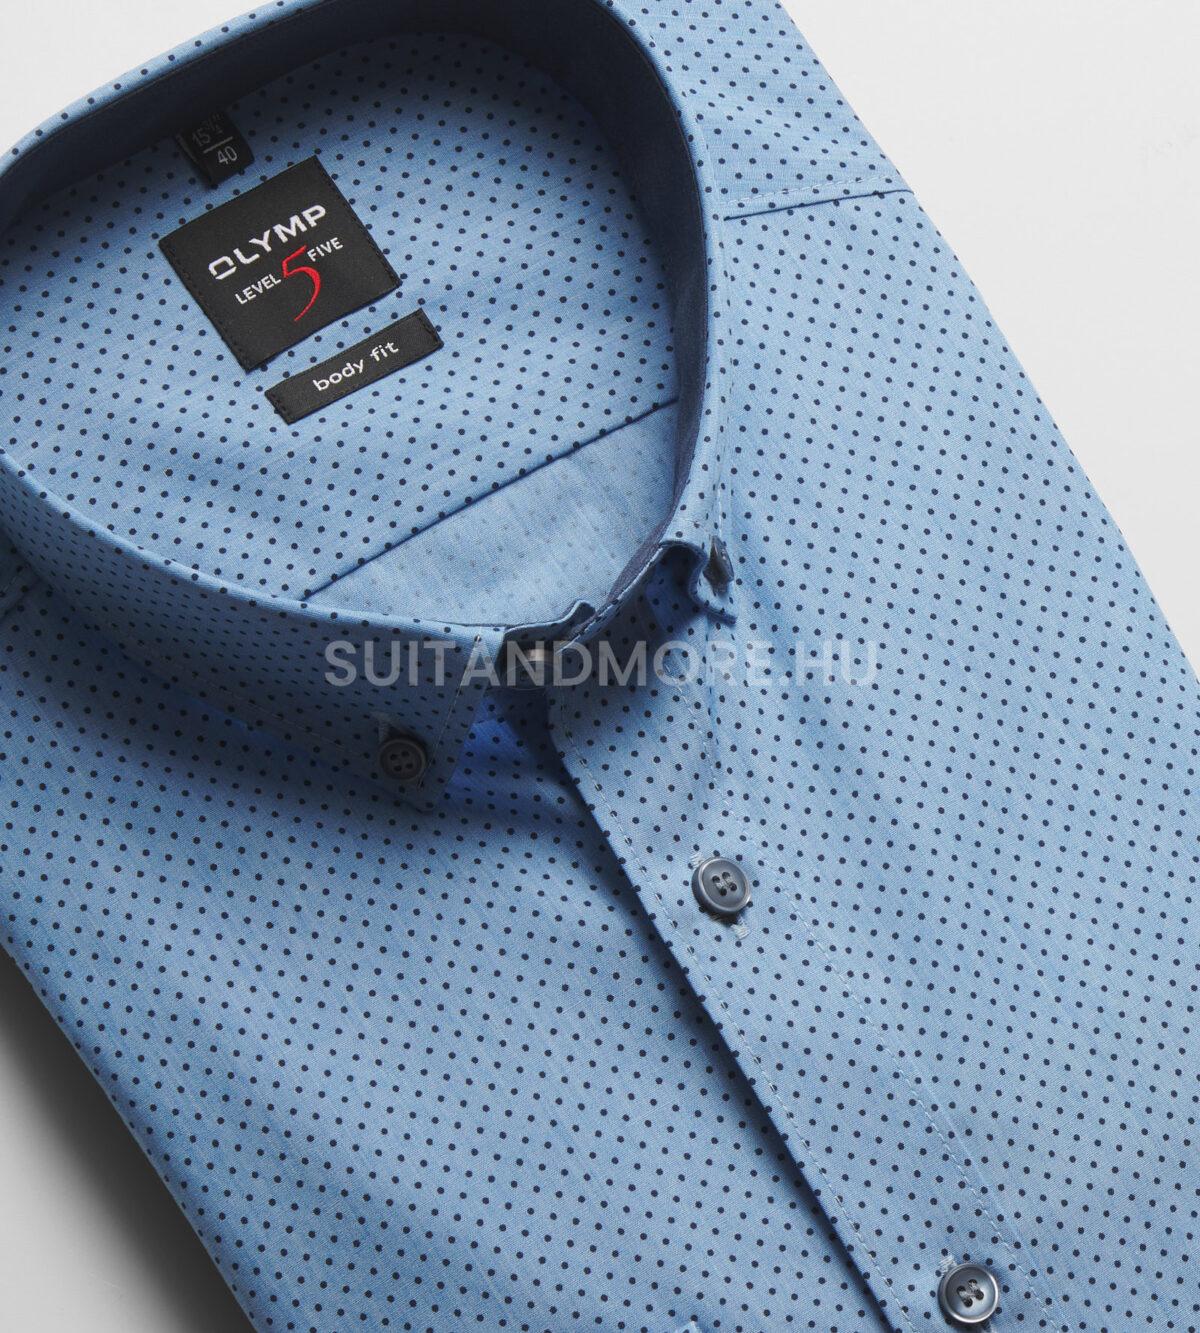 OLYMP-kék-slim-fit-pettyes-vasaláskönnyített-ing-2118-74-11-02